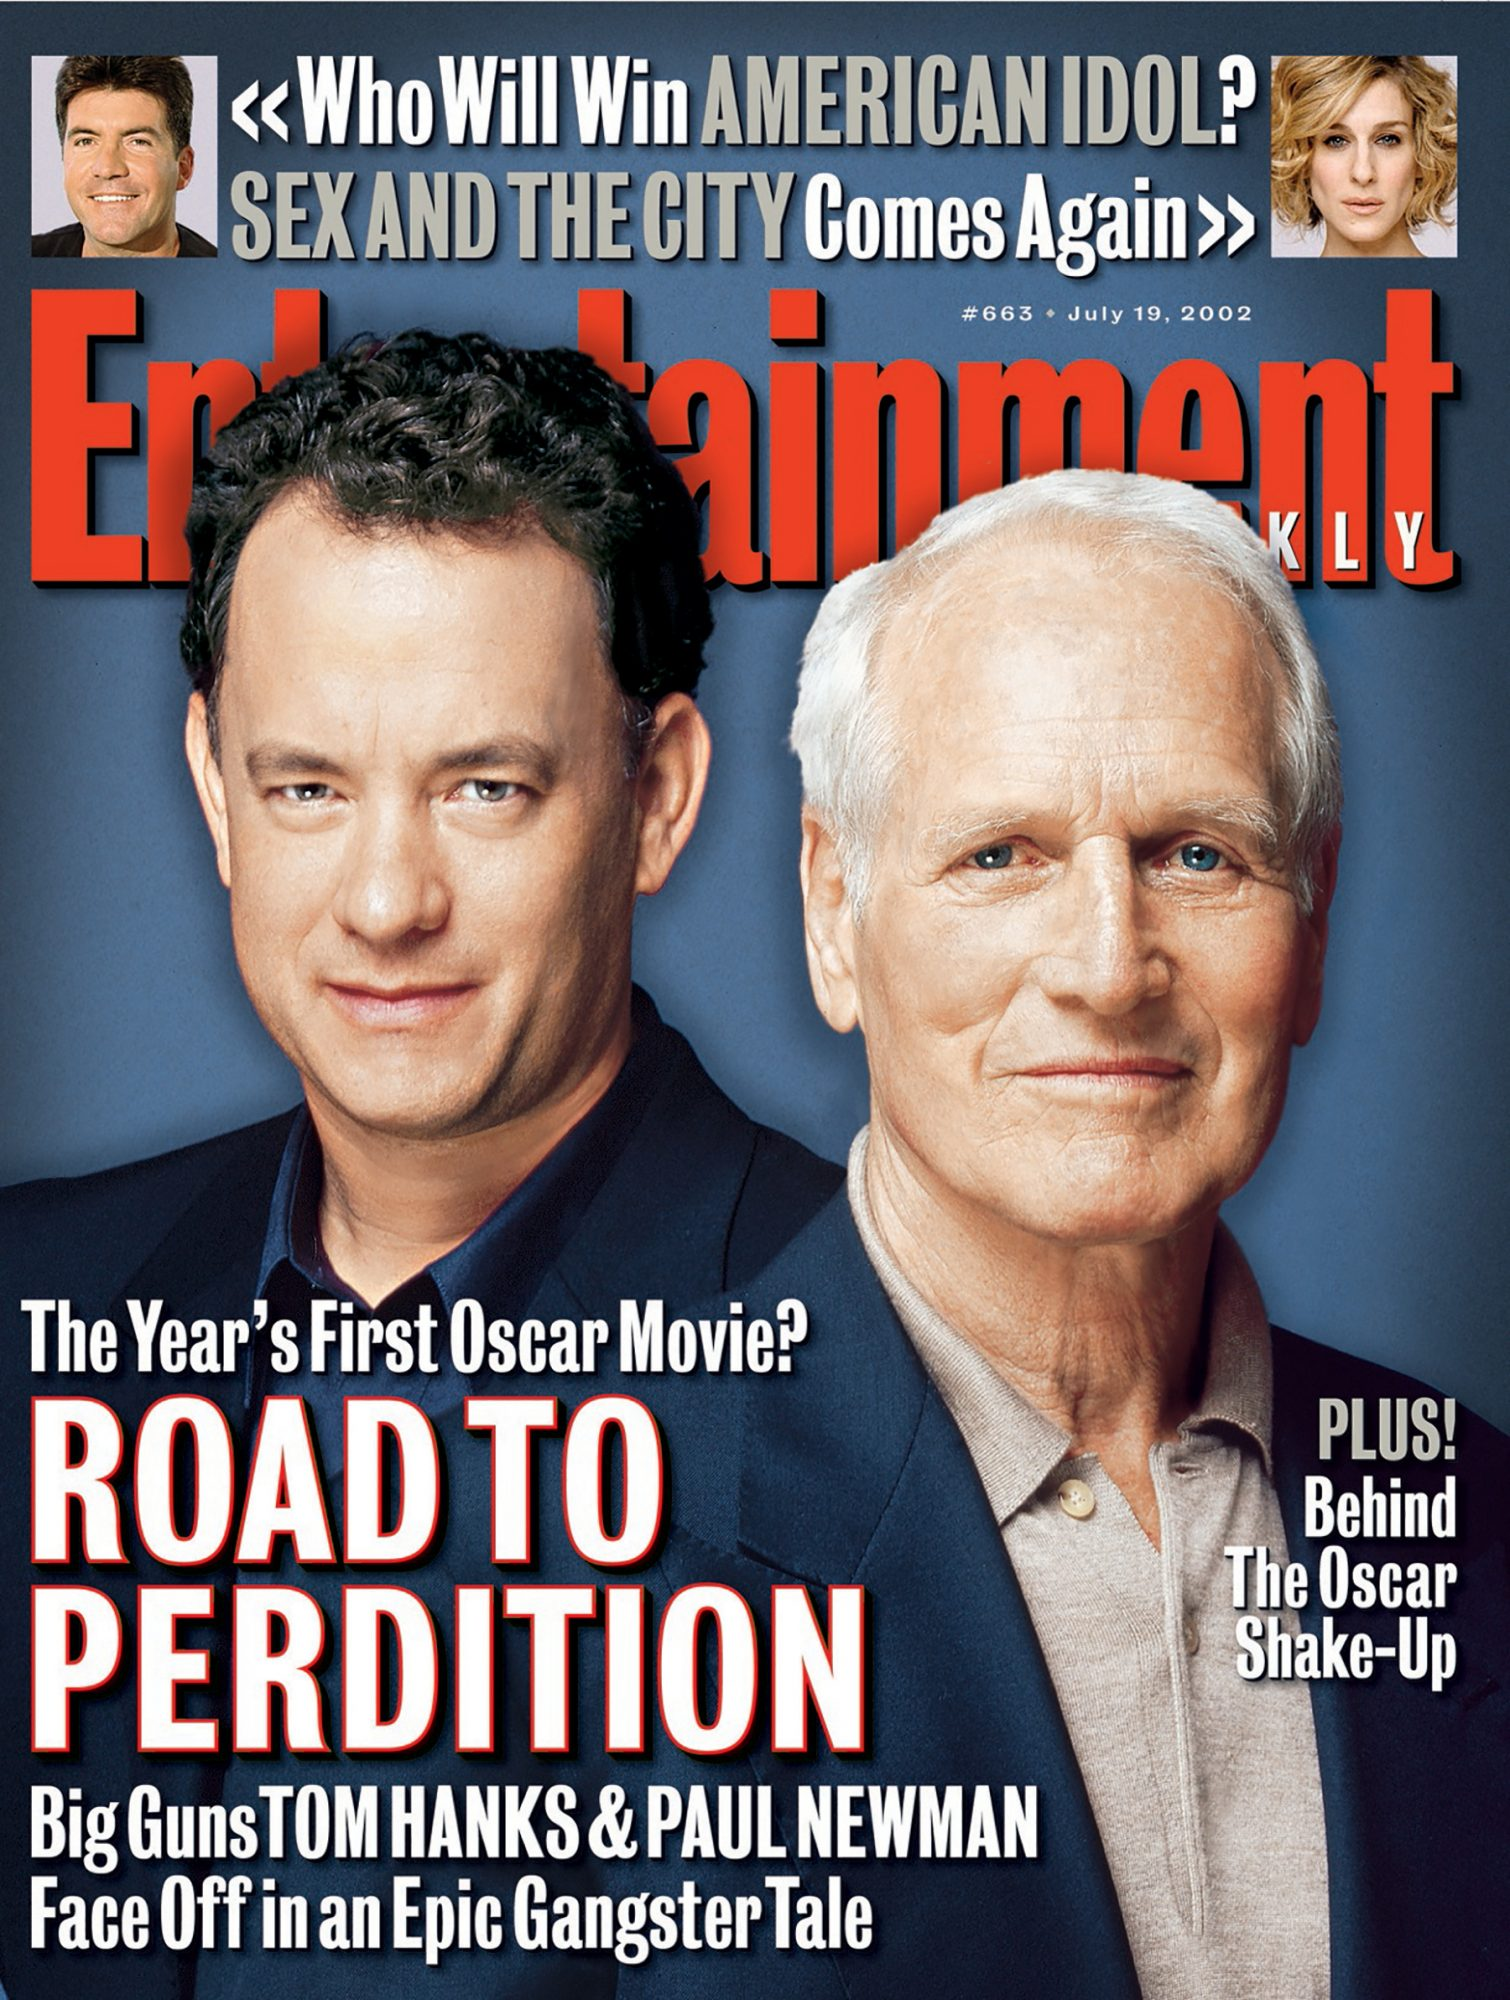 Entertainment WeeklyTom Hanks, Paul NewmanJuly 19, 2002# 663